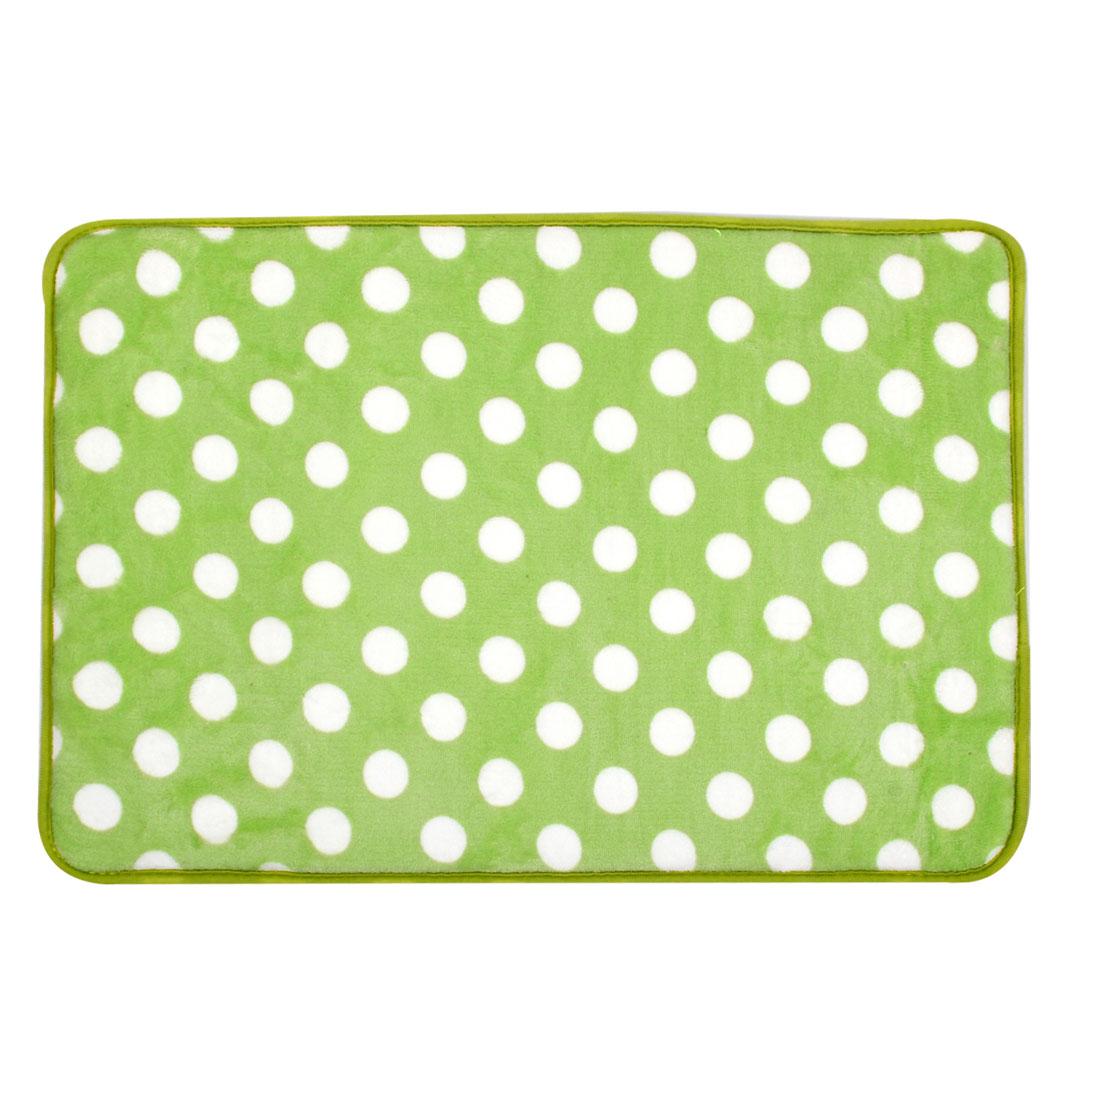 60cm x 40cm Light Green Dots Print Nonslip Bedroom Floor Mat Area Rug Carpet